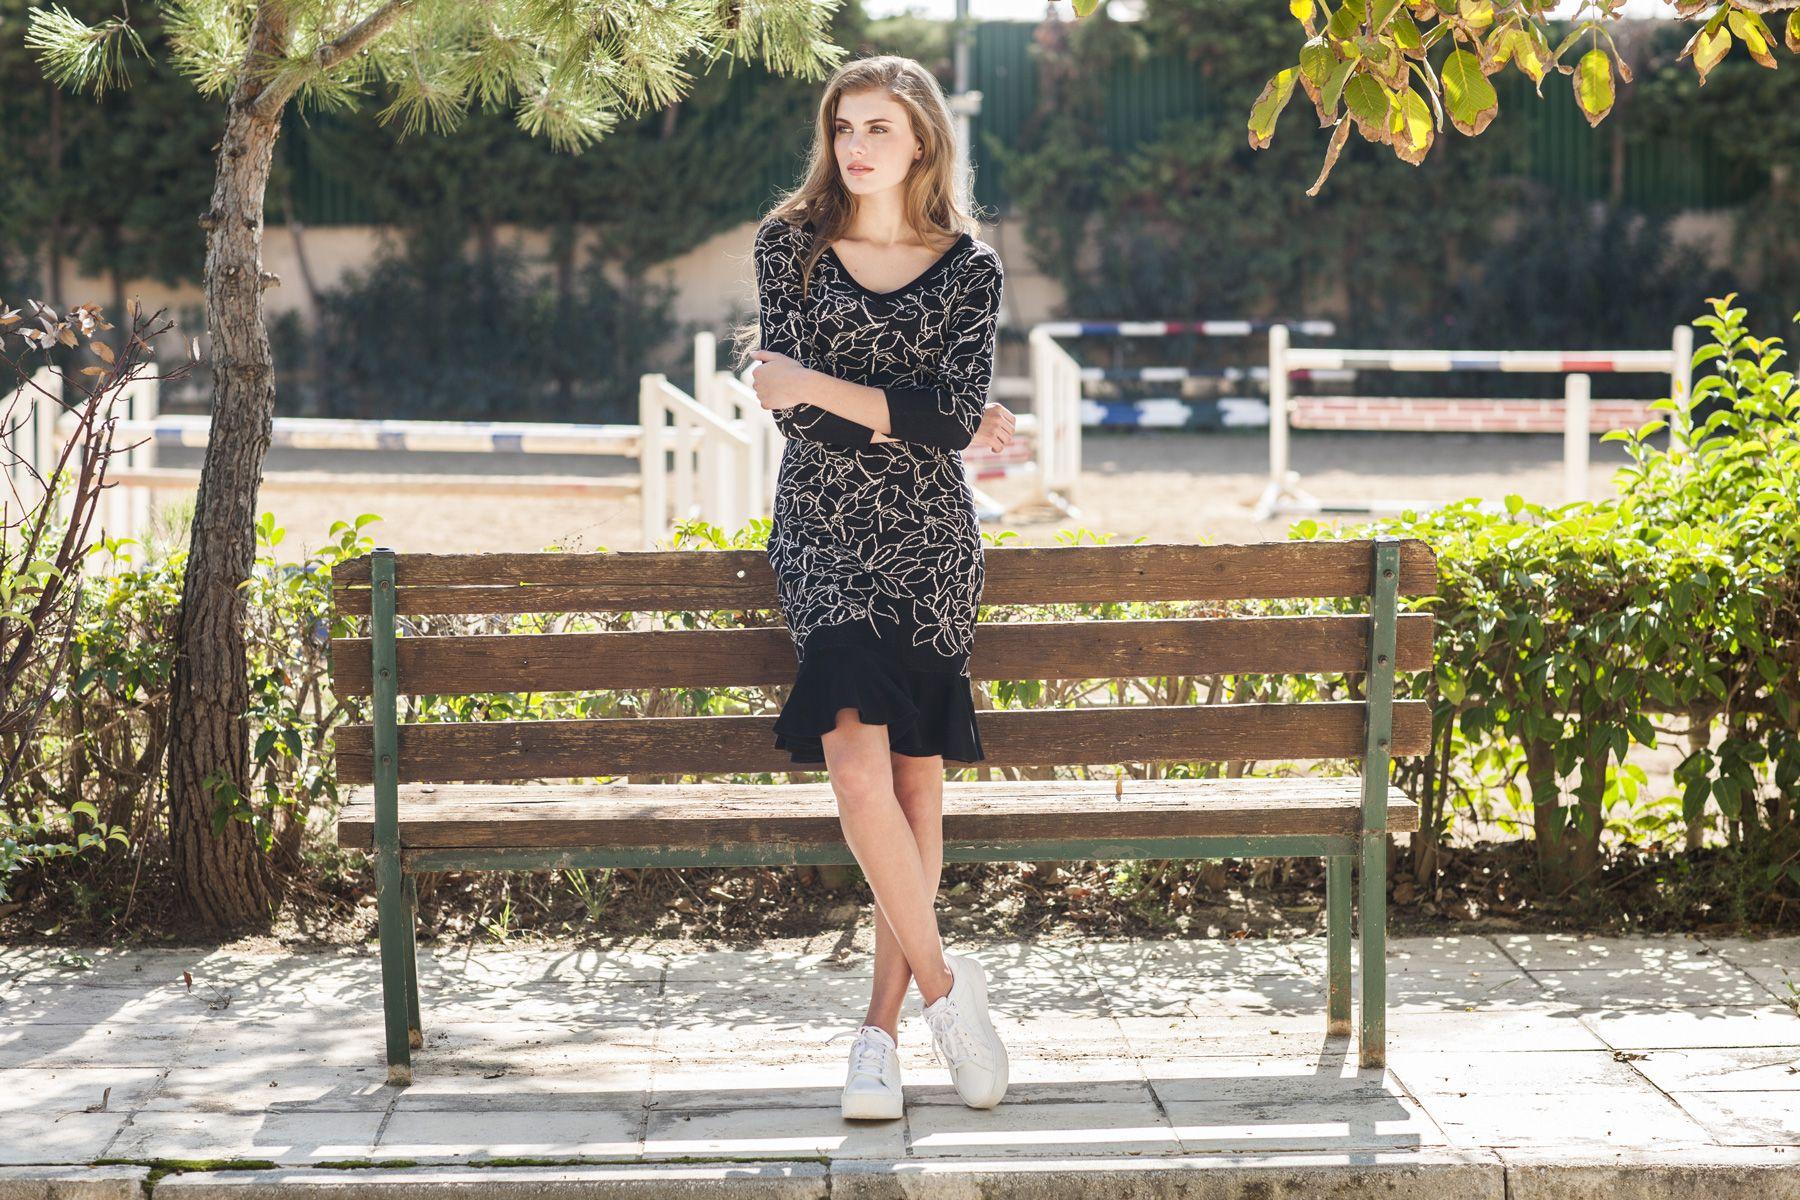 67a2860b861 SWEATER DRESSES: A LOVE AFAIR! Τα πλεκτά φορέματα επέστρεψαν με νέα ...